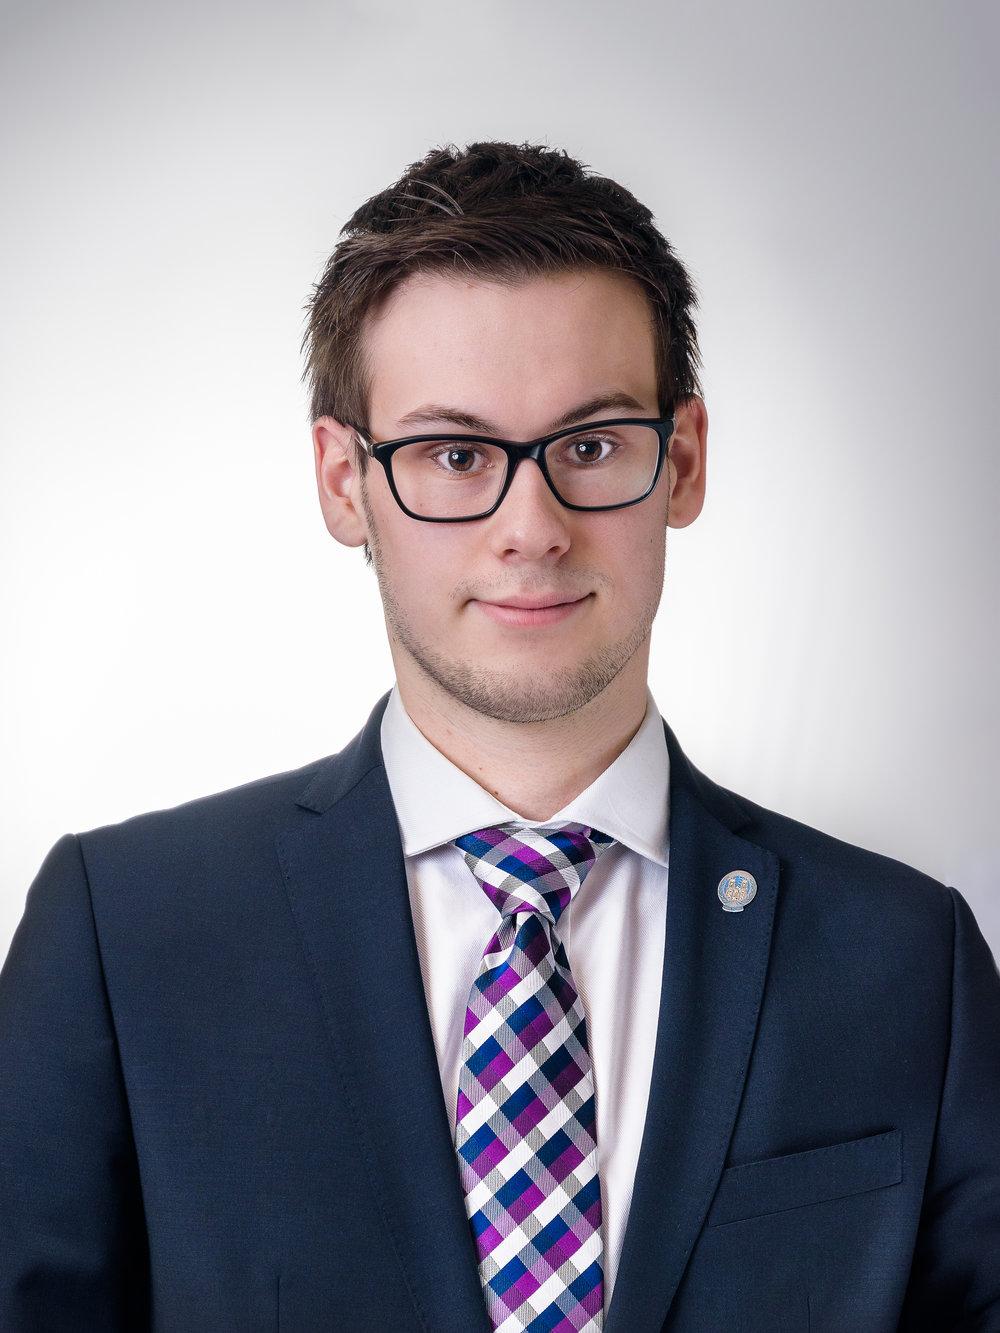 Johannas Gaechter - President